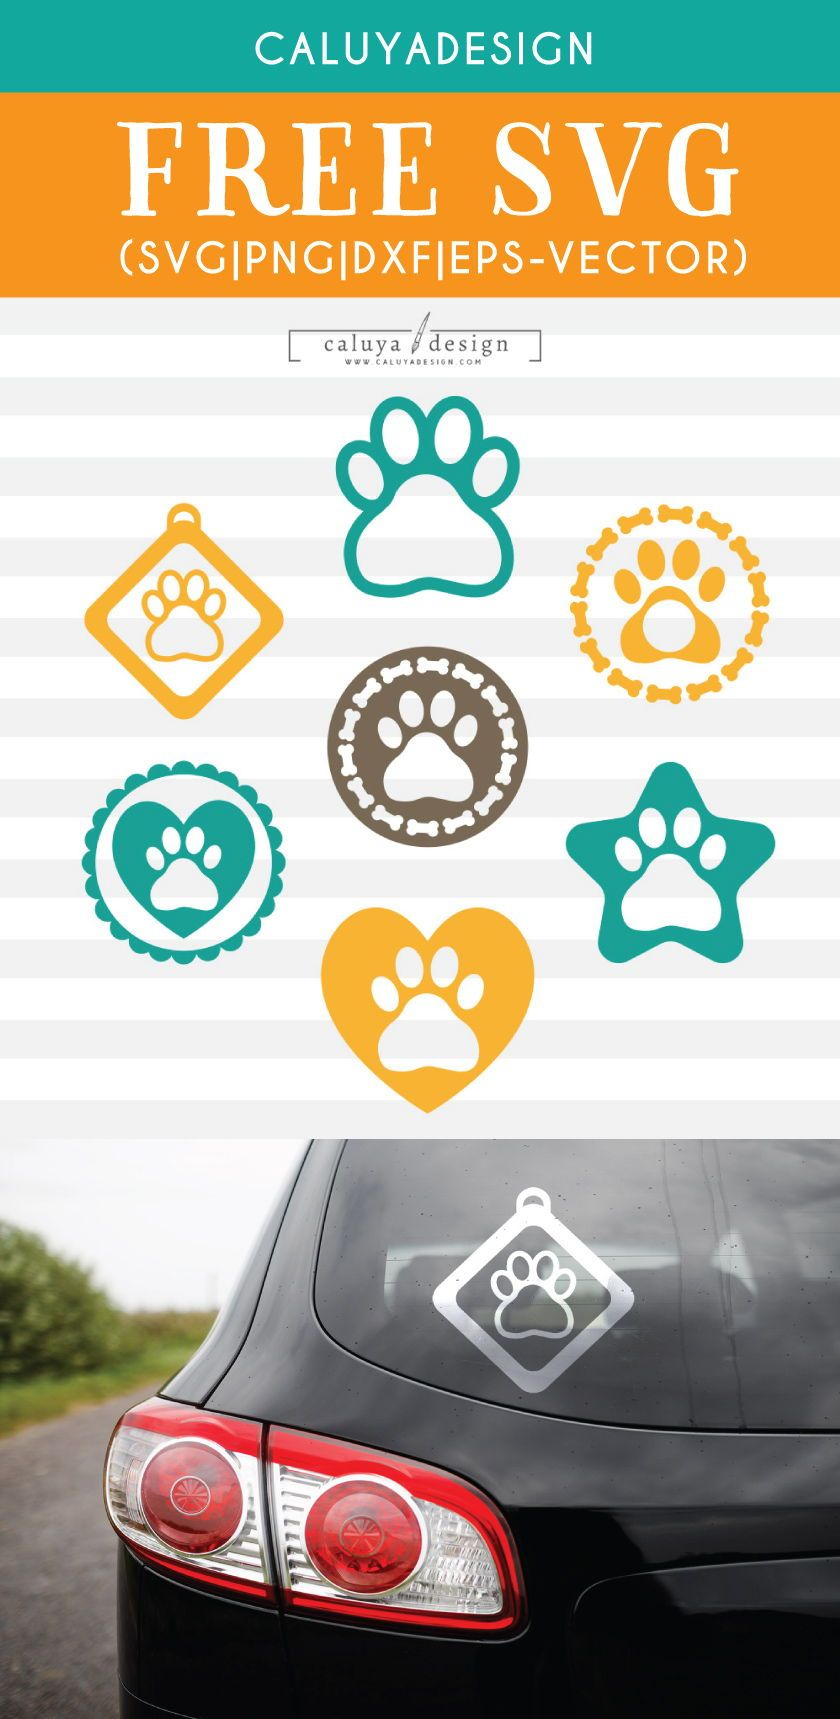 Free Dog Paw Svg Png Eps Dxf By Caluya Design Cricut Svg Monogram Svg